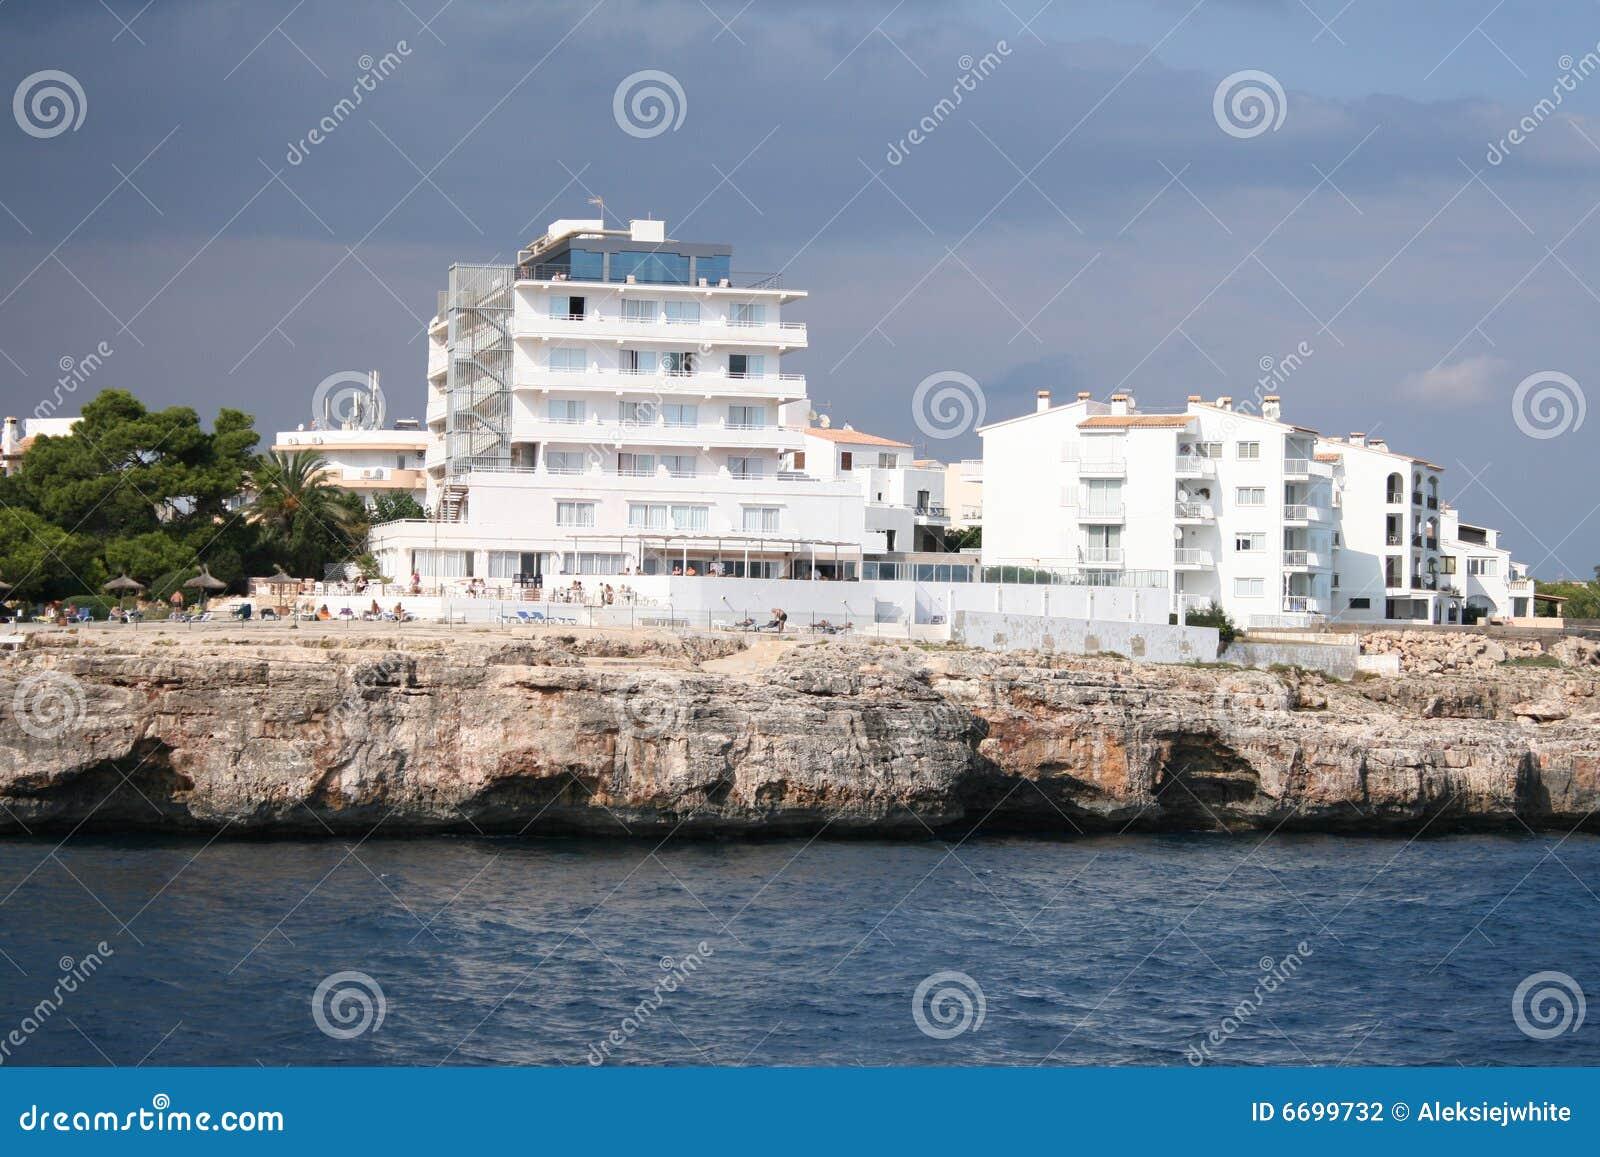 Hotels Mallorca Animation